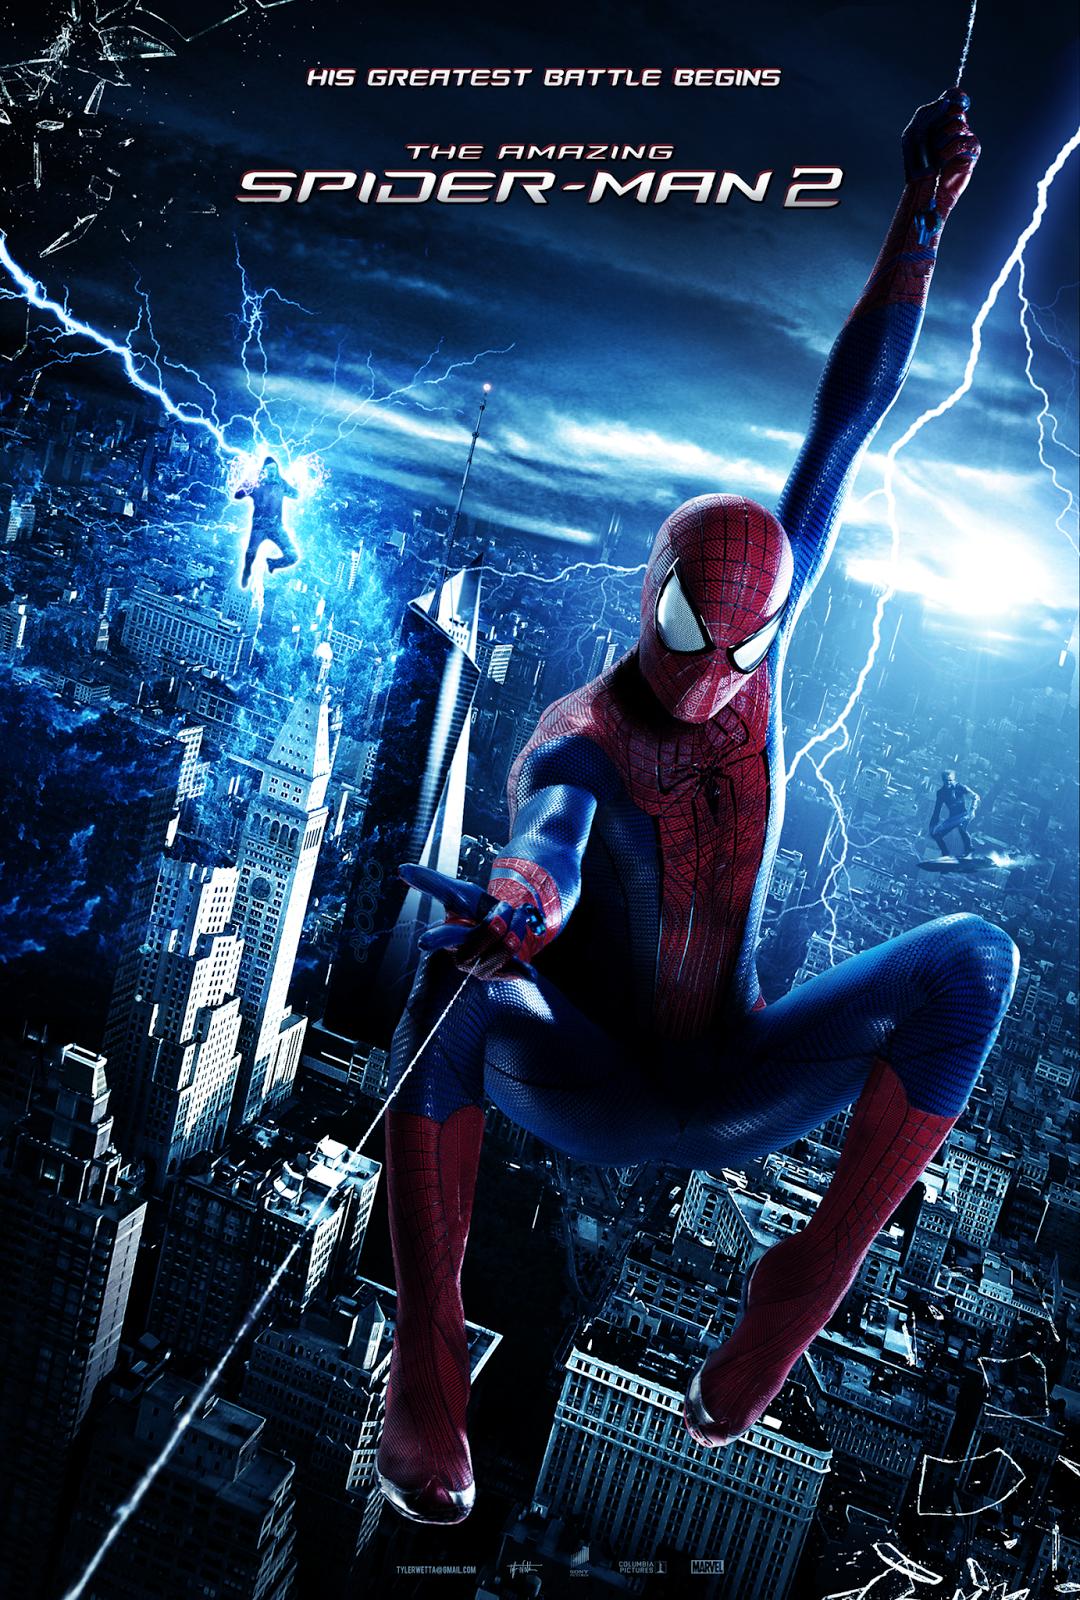 Download film the amazing spider man 2 2014 bluray 720p subtitle indonesia http